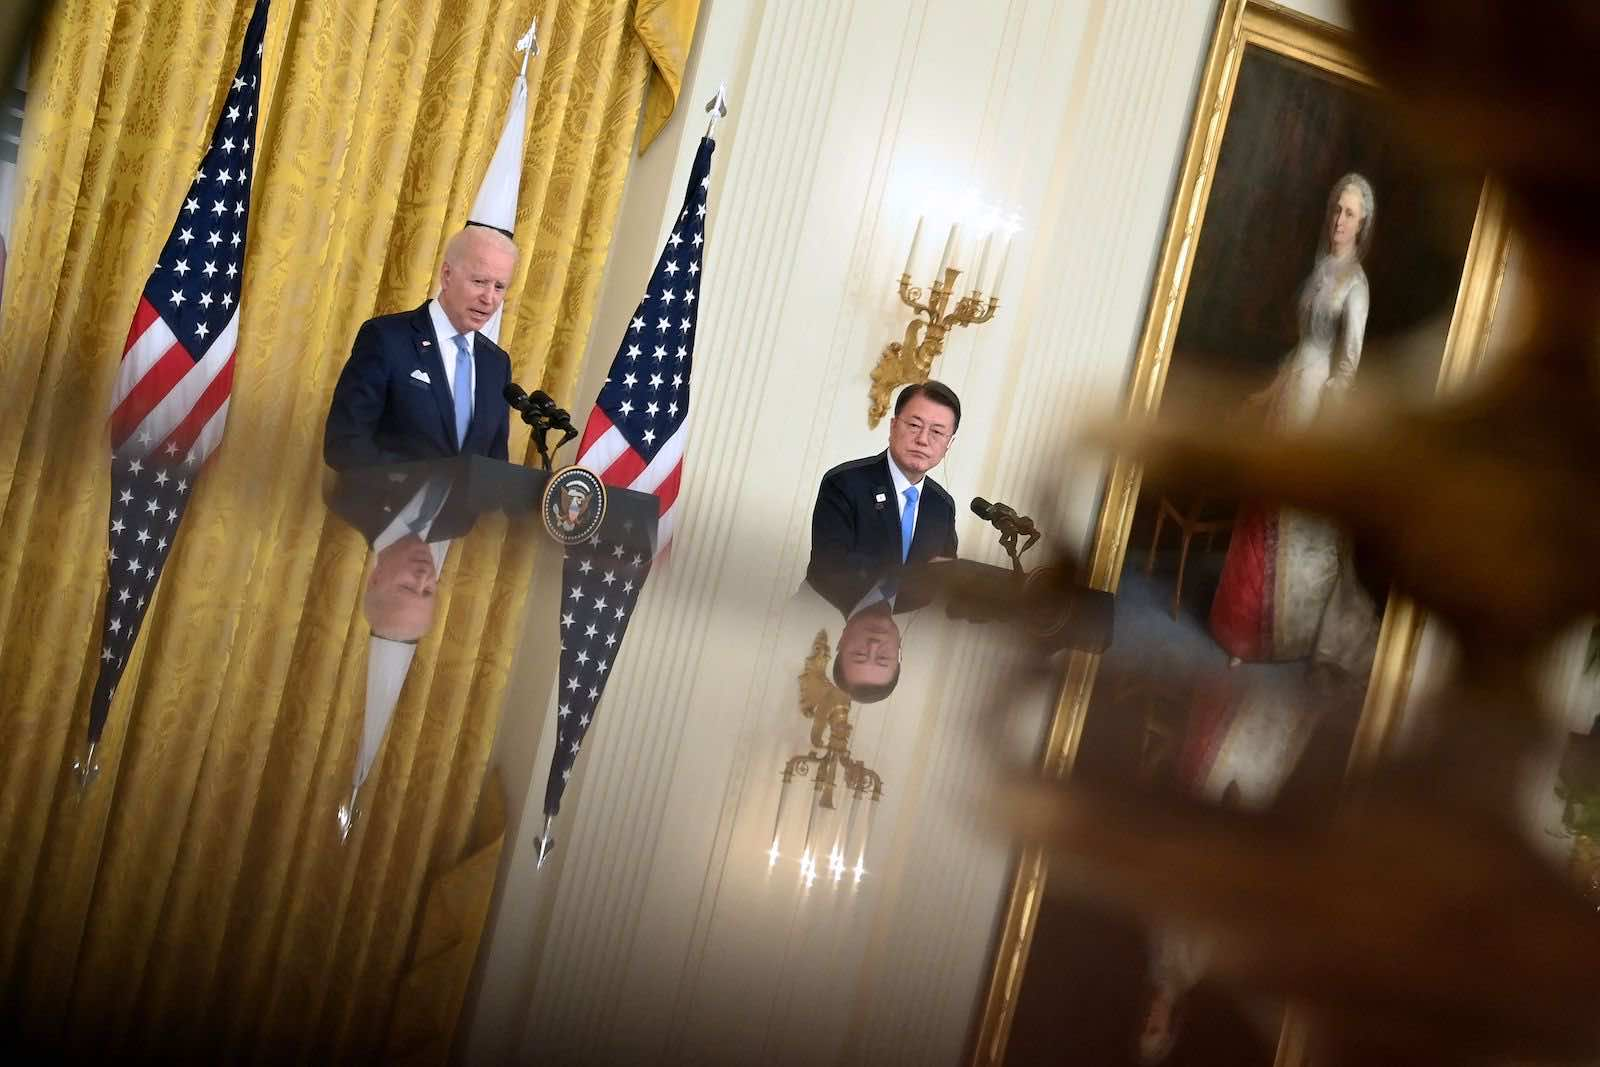 US President Joe Biden and South Korean President Moon Jae-in at the White House on 21 May (Brendan Smialowski/AFP via Getty Images)